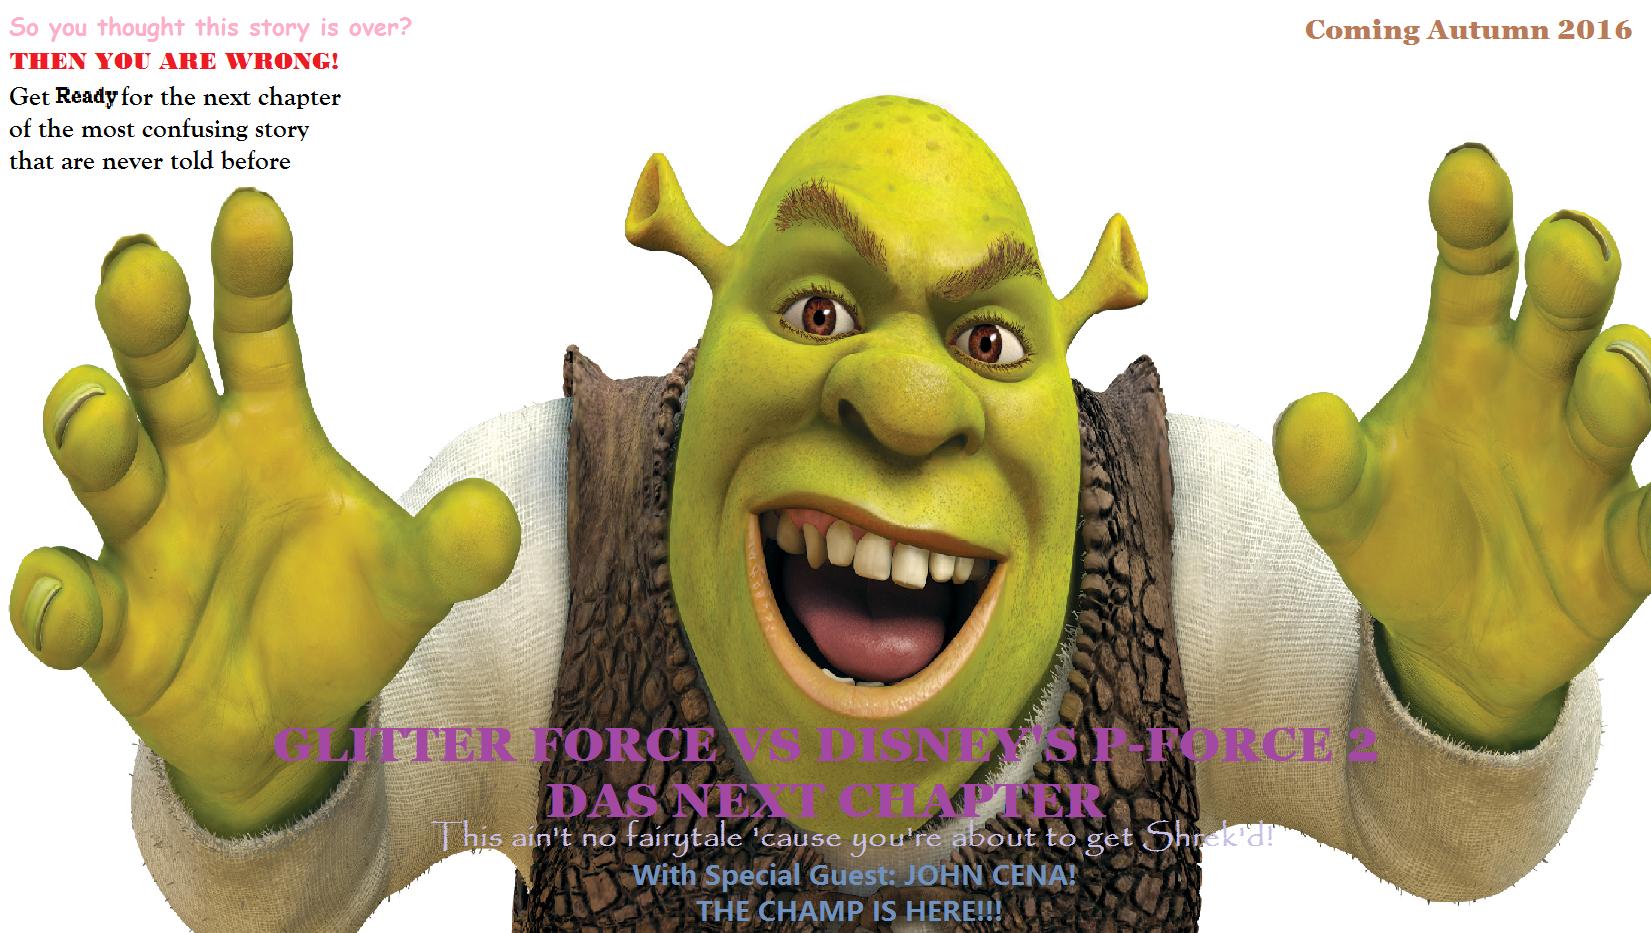 Glitter Force VS Disney's P-Force 2: Das Next Chapter